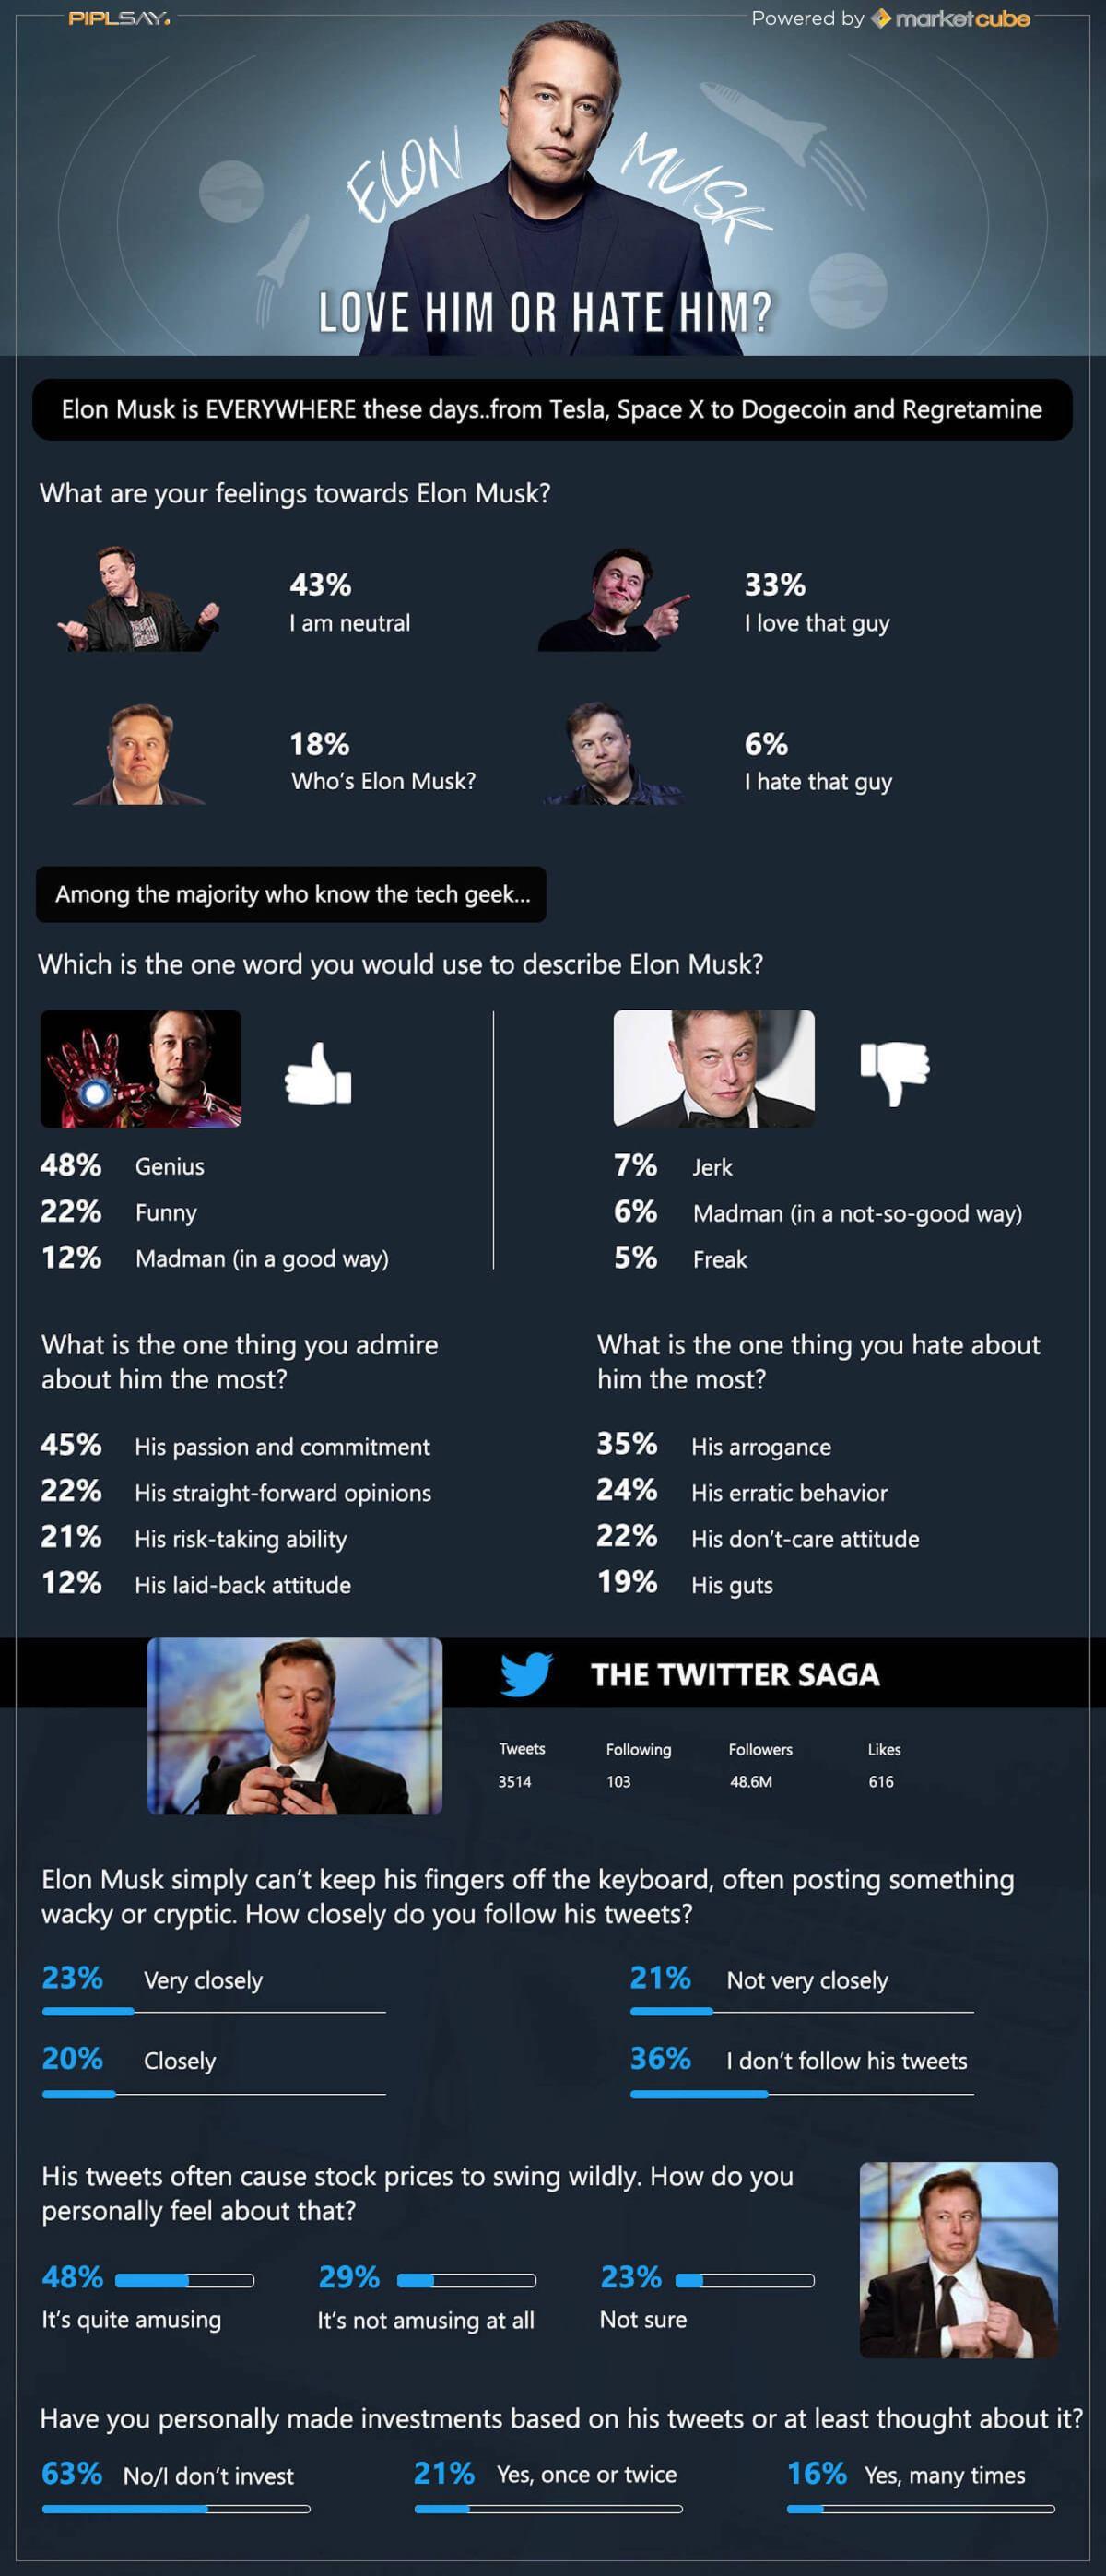 Piplsay Survey